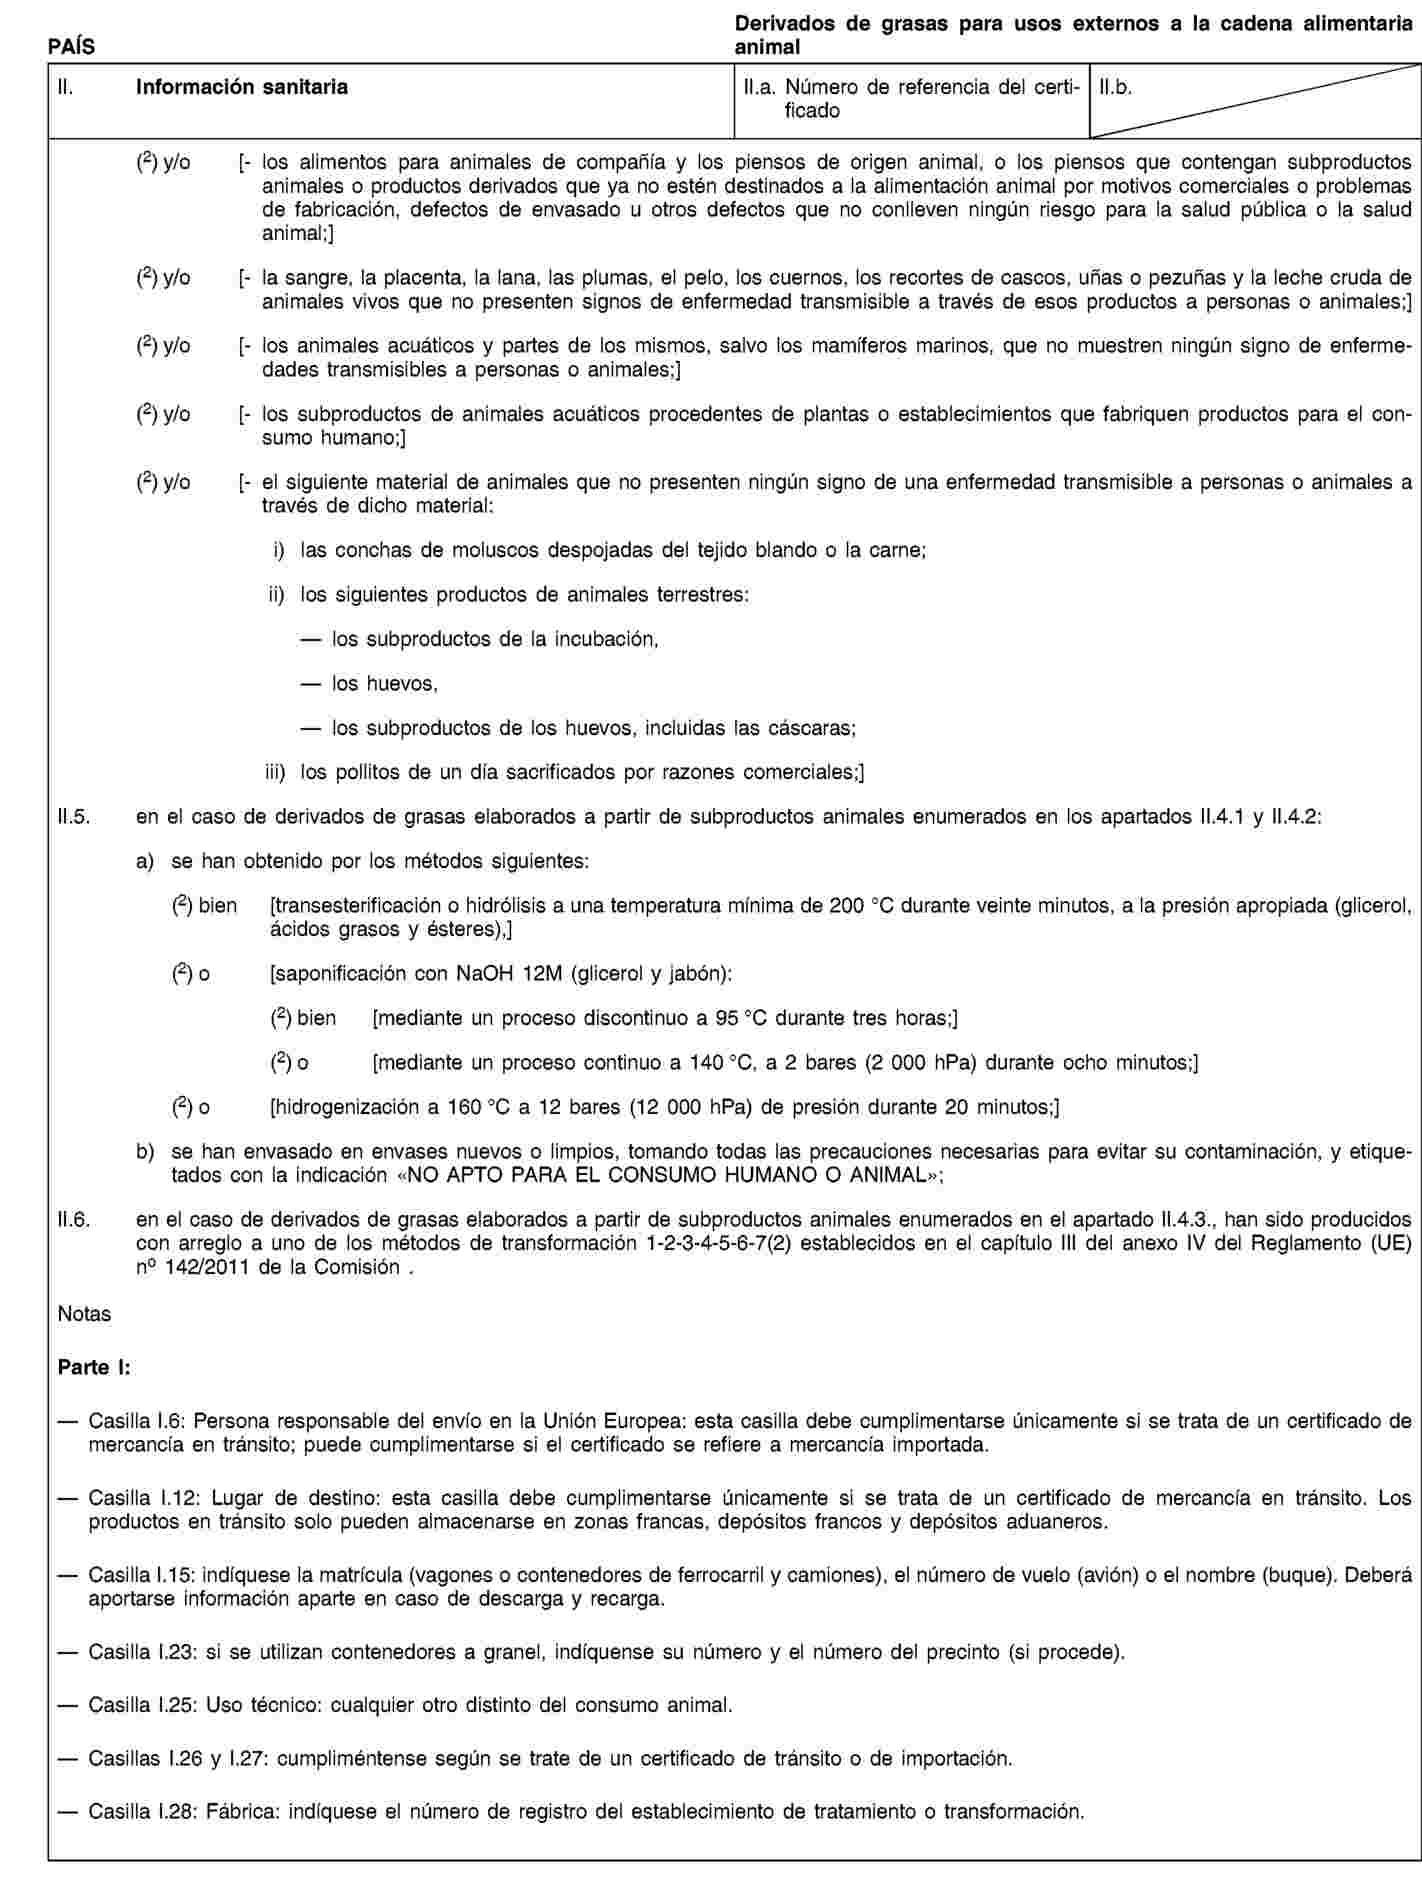 Imagen: https://eur-lex.europa.eu/resource.html?uri=uriserv:OJ.L_.2011.054.01.0001.01.SPA.xhtml.L_2011054ES.01022701.tif.jpg